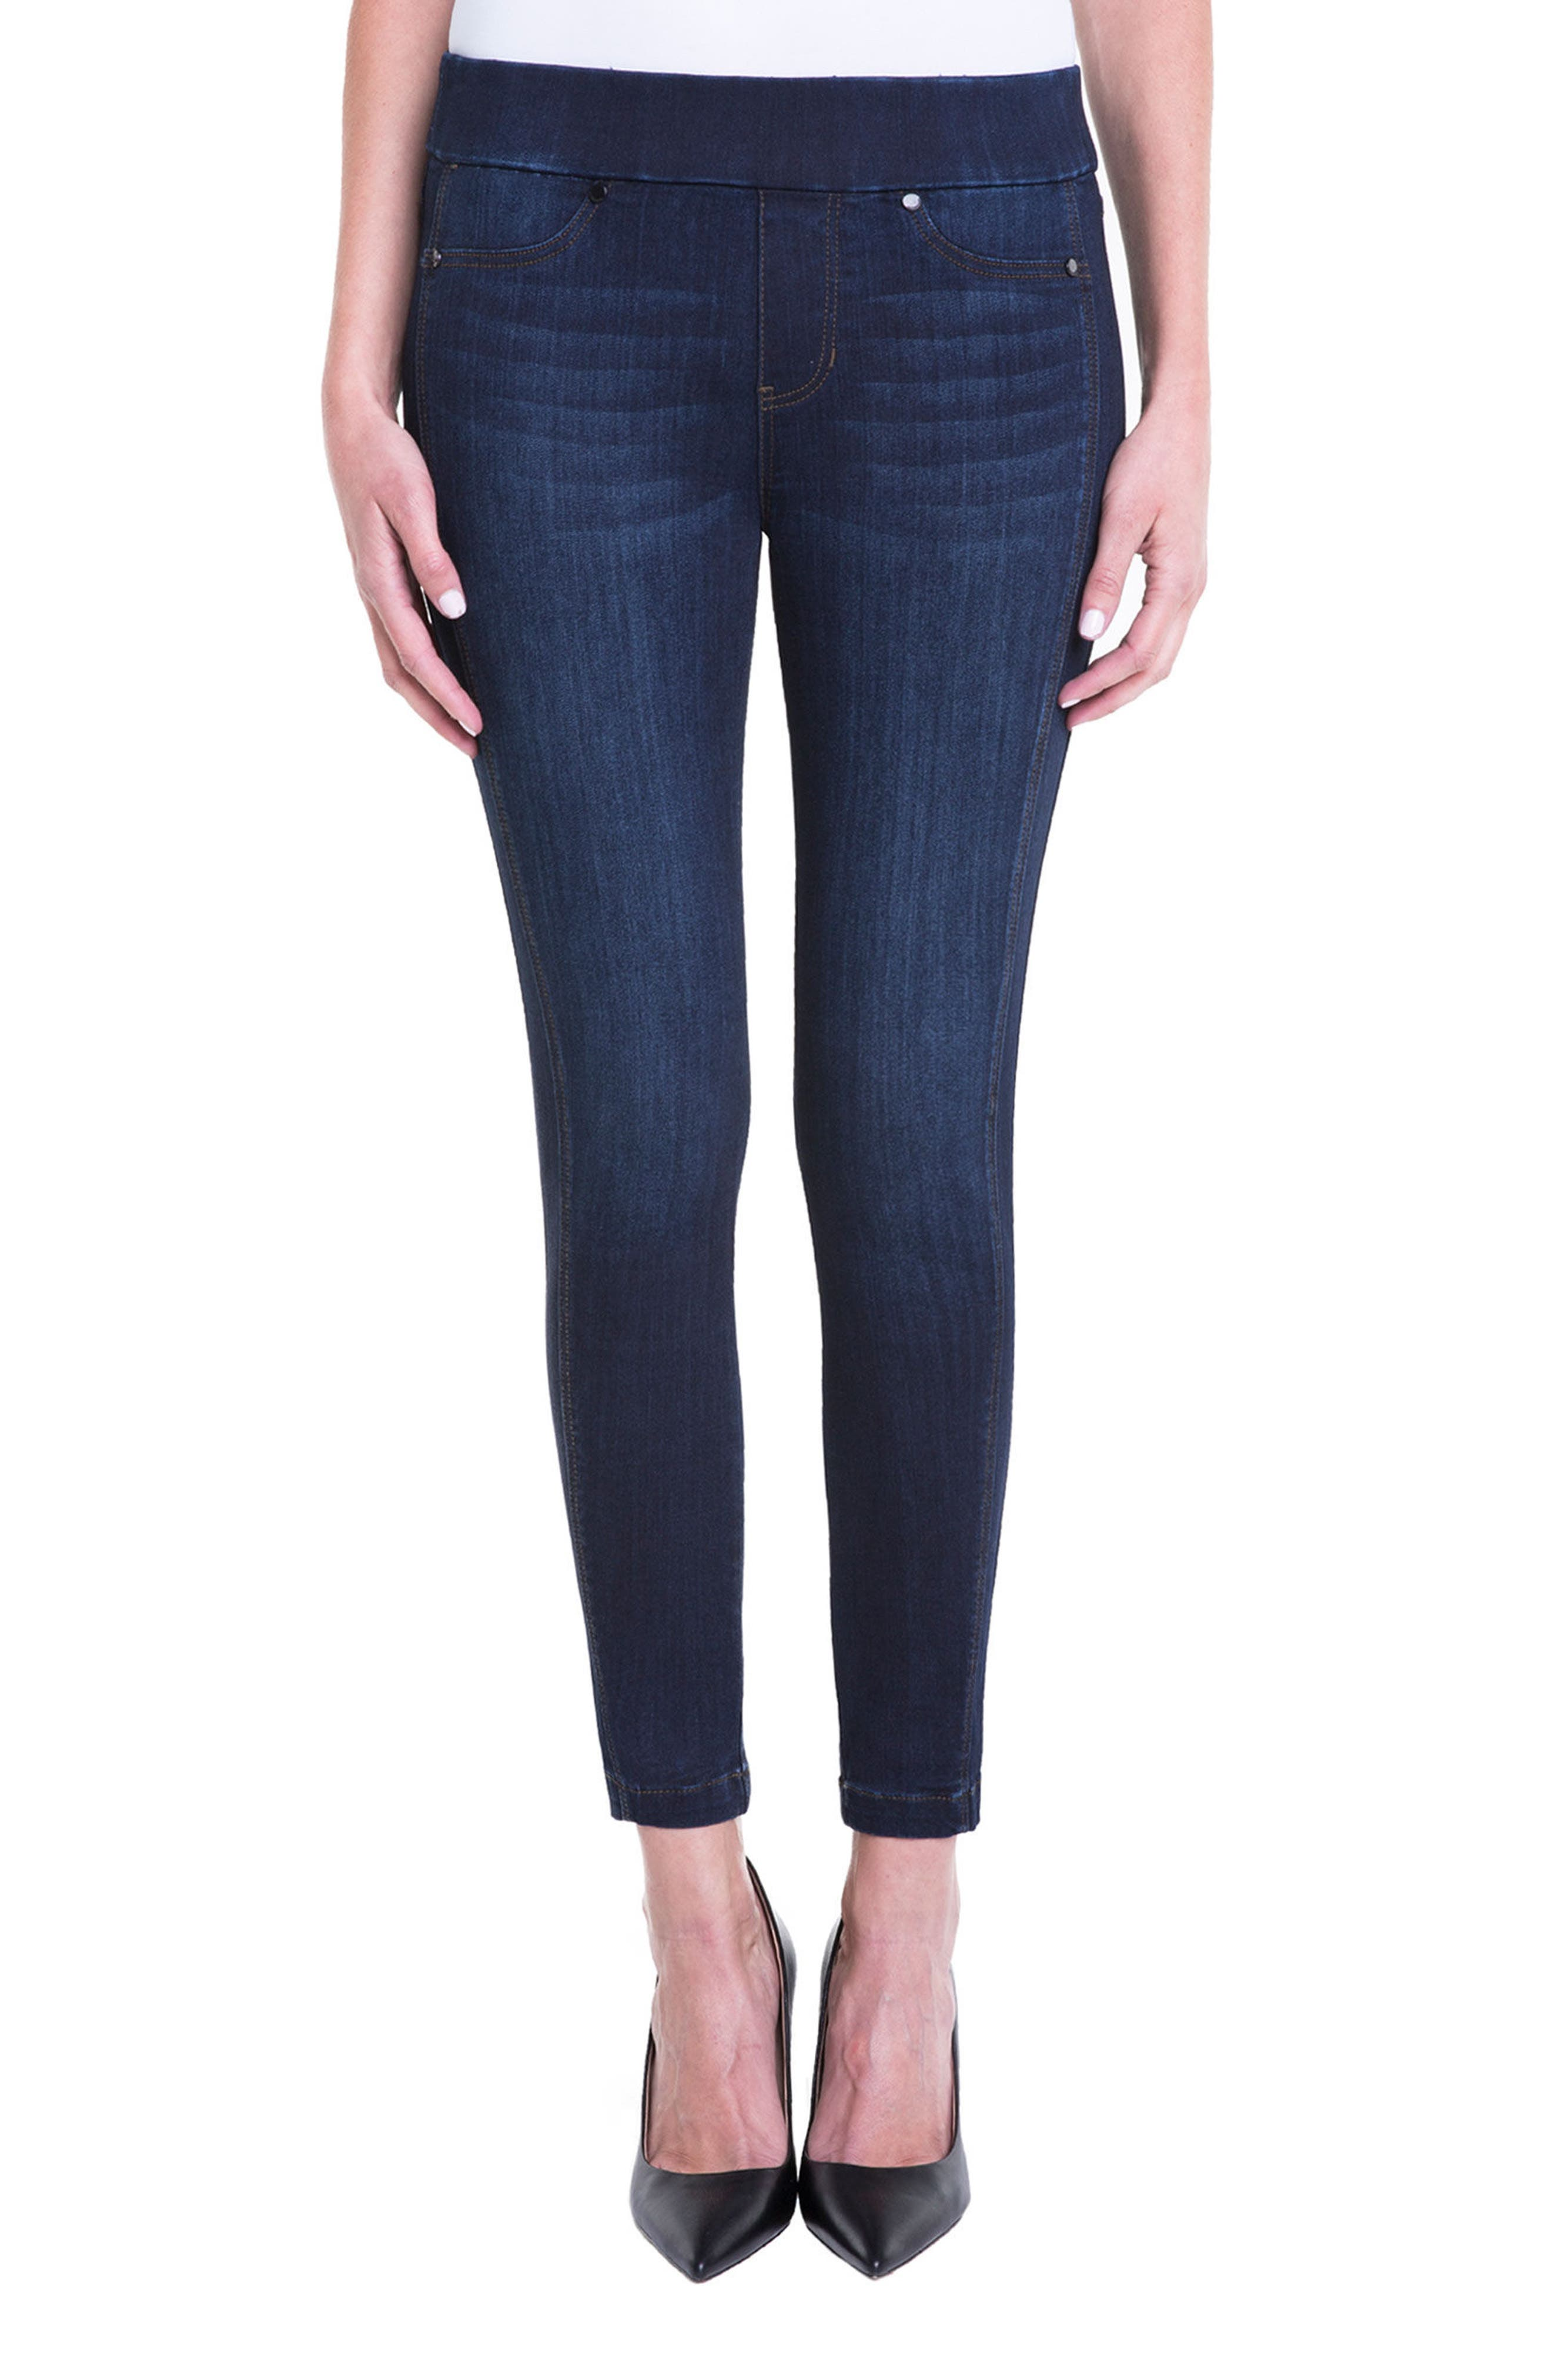 Liverpool Jeans Company Sophia Ankle Denim Leggings